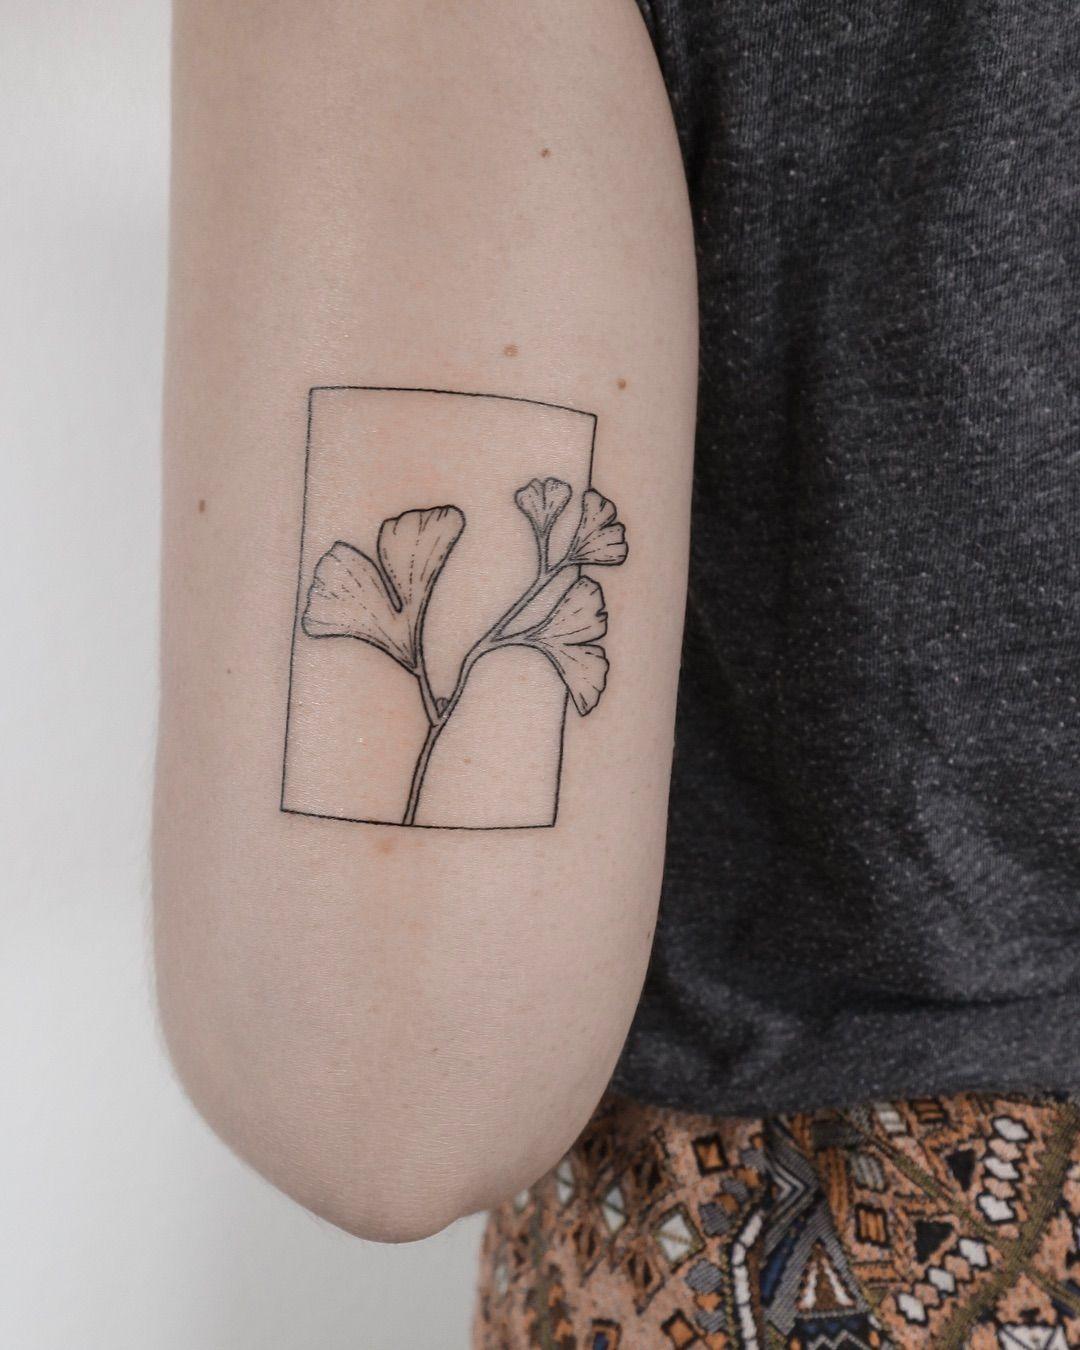 Ann Gilberg Handpoke Tattoos On Instagram Ginkgo In A Frame